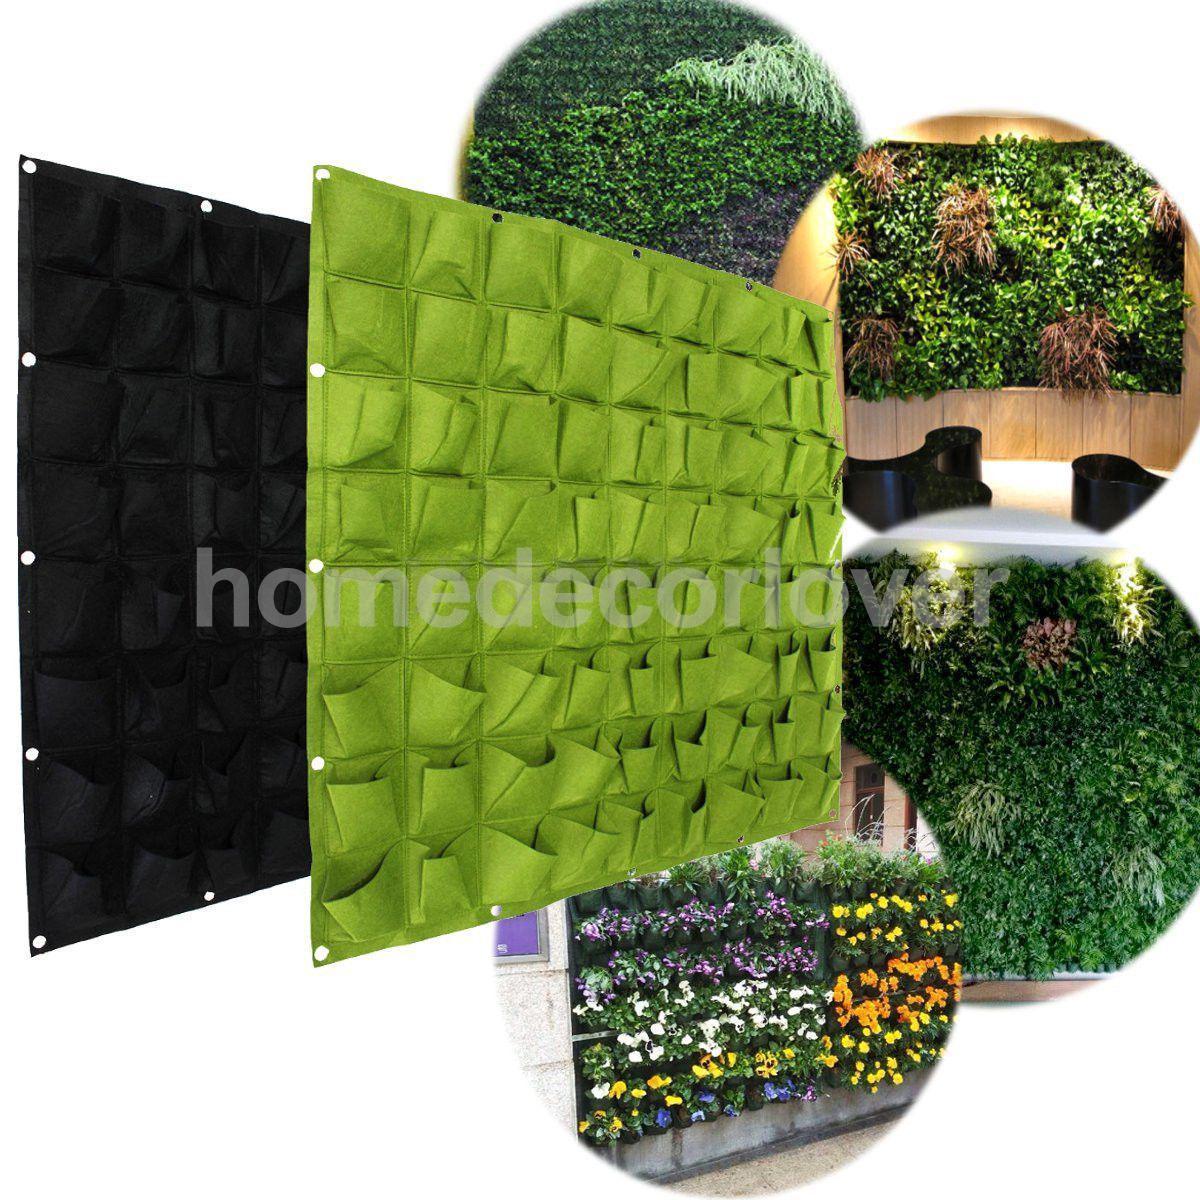 Popular Herb Wall GardenBuy Cheap Herb Wall Garden lots from